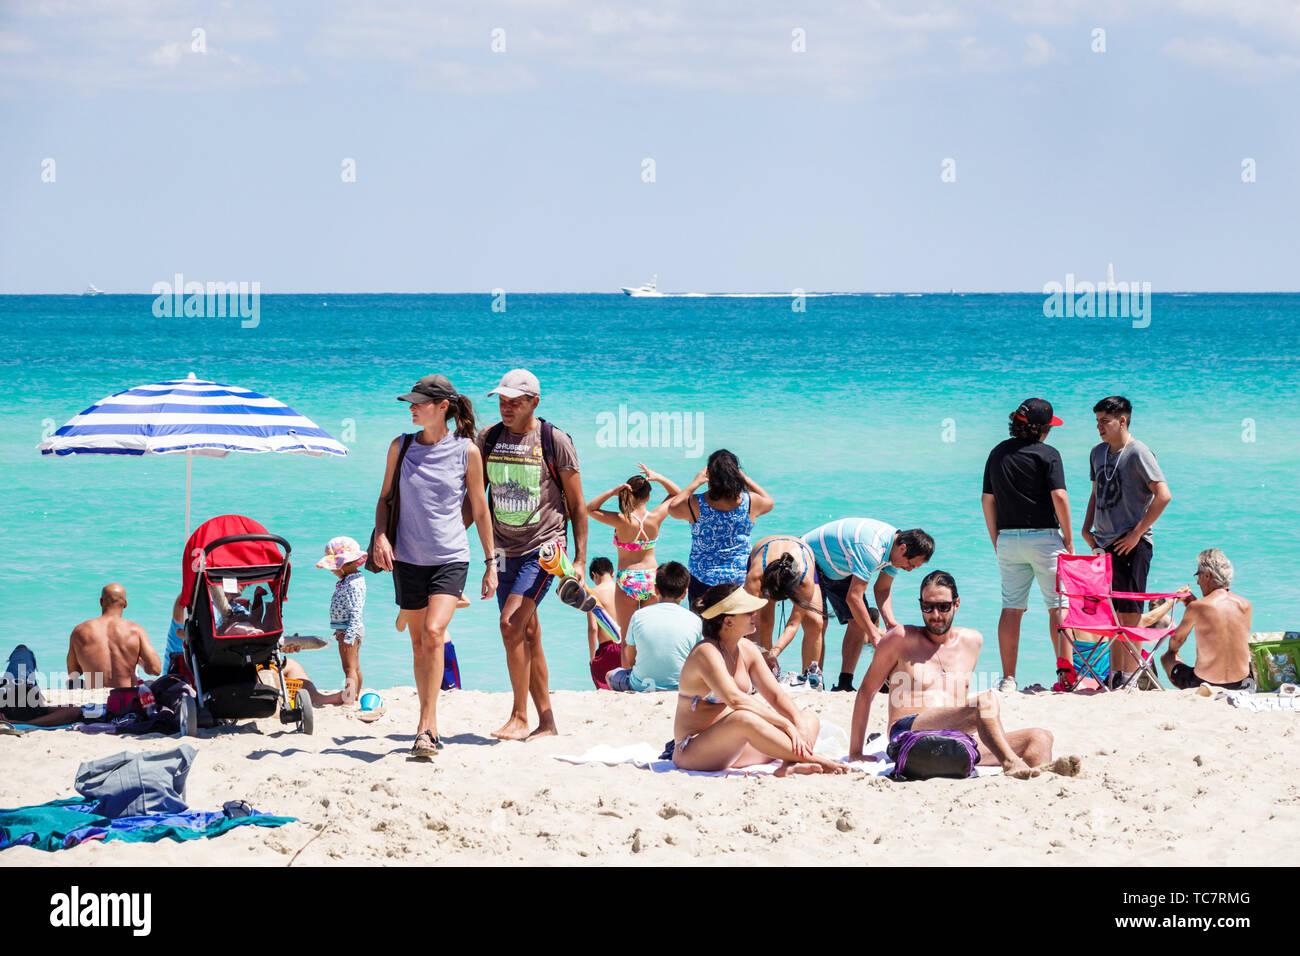 Miami Beach Florida North Beach Atlantic Ocean sunbathers Hispanic man woman couple families public water - Stock Image